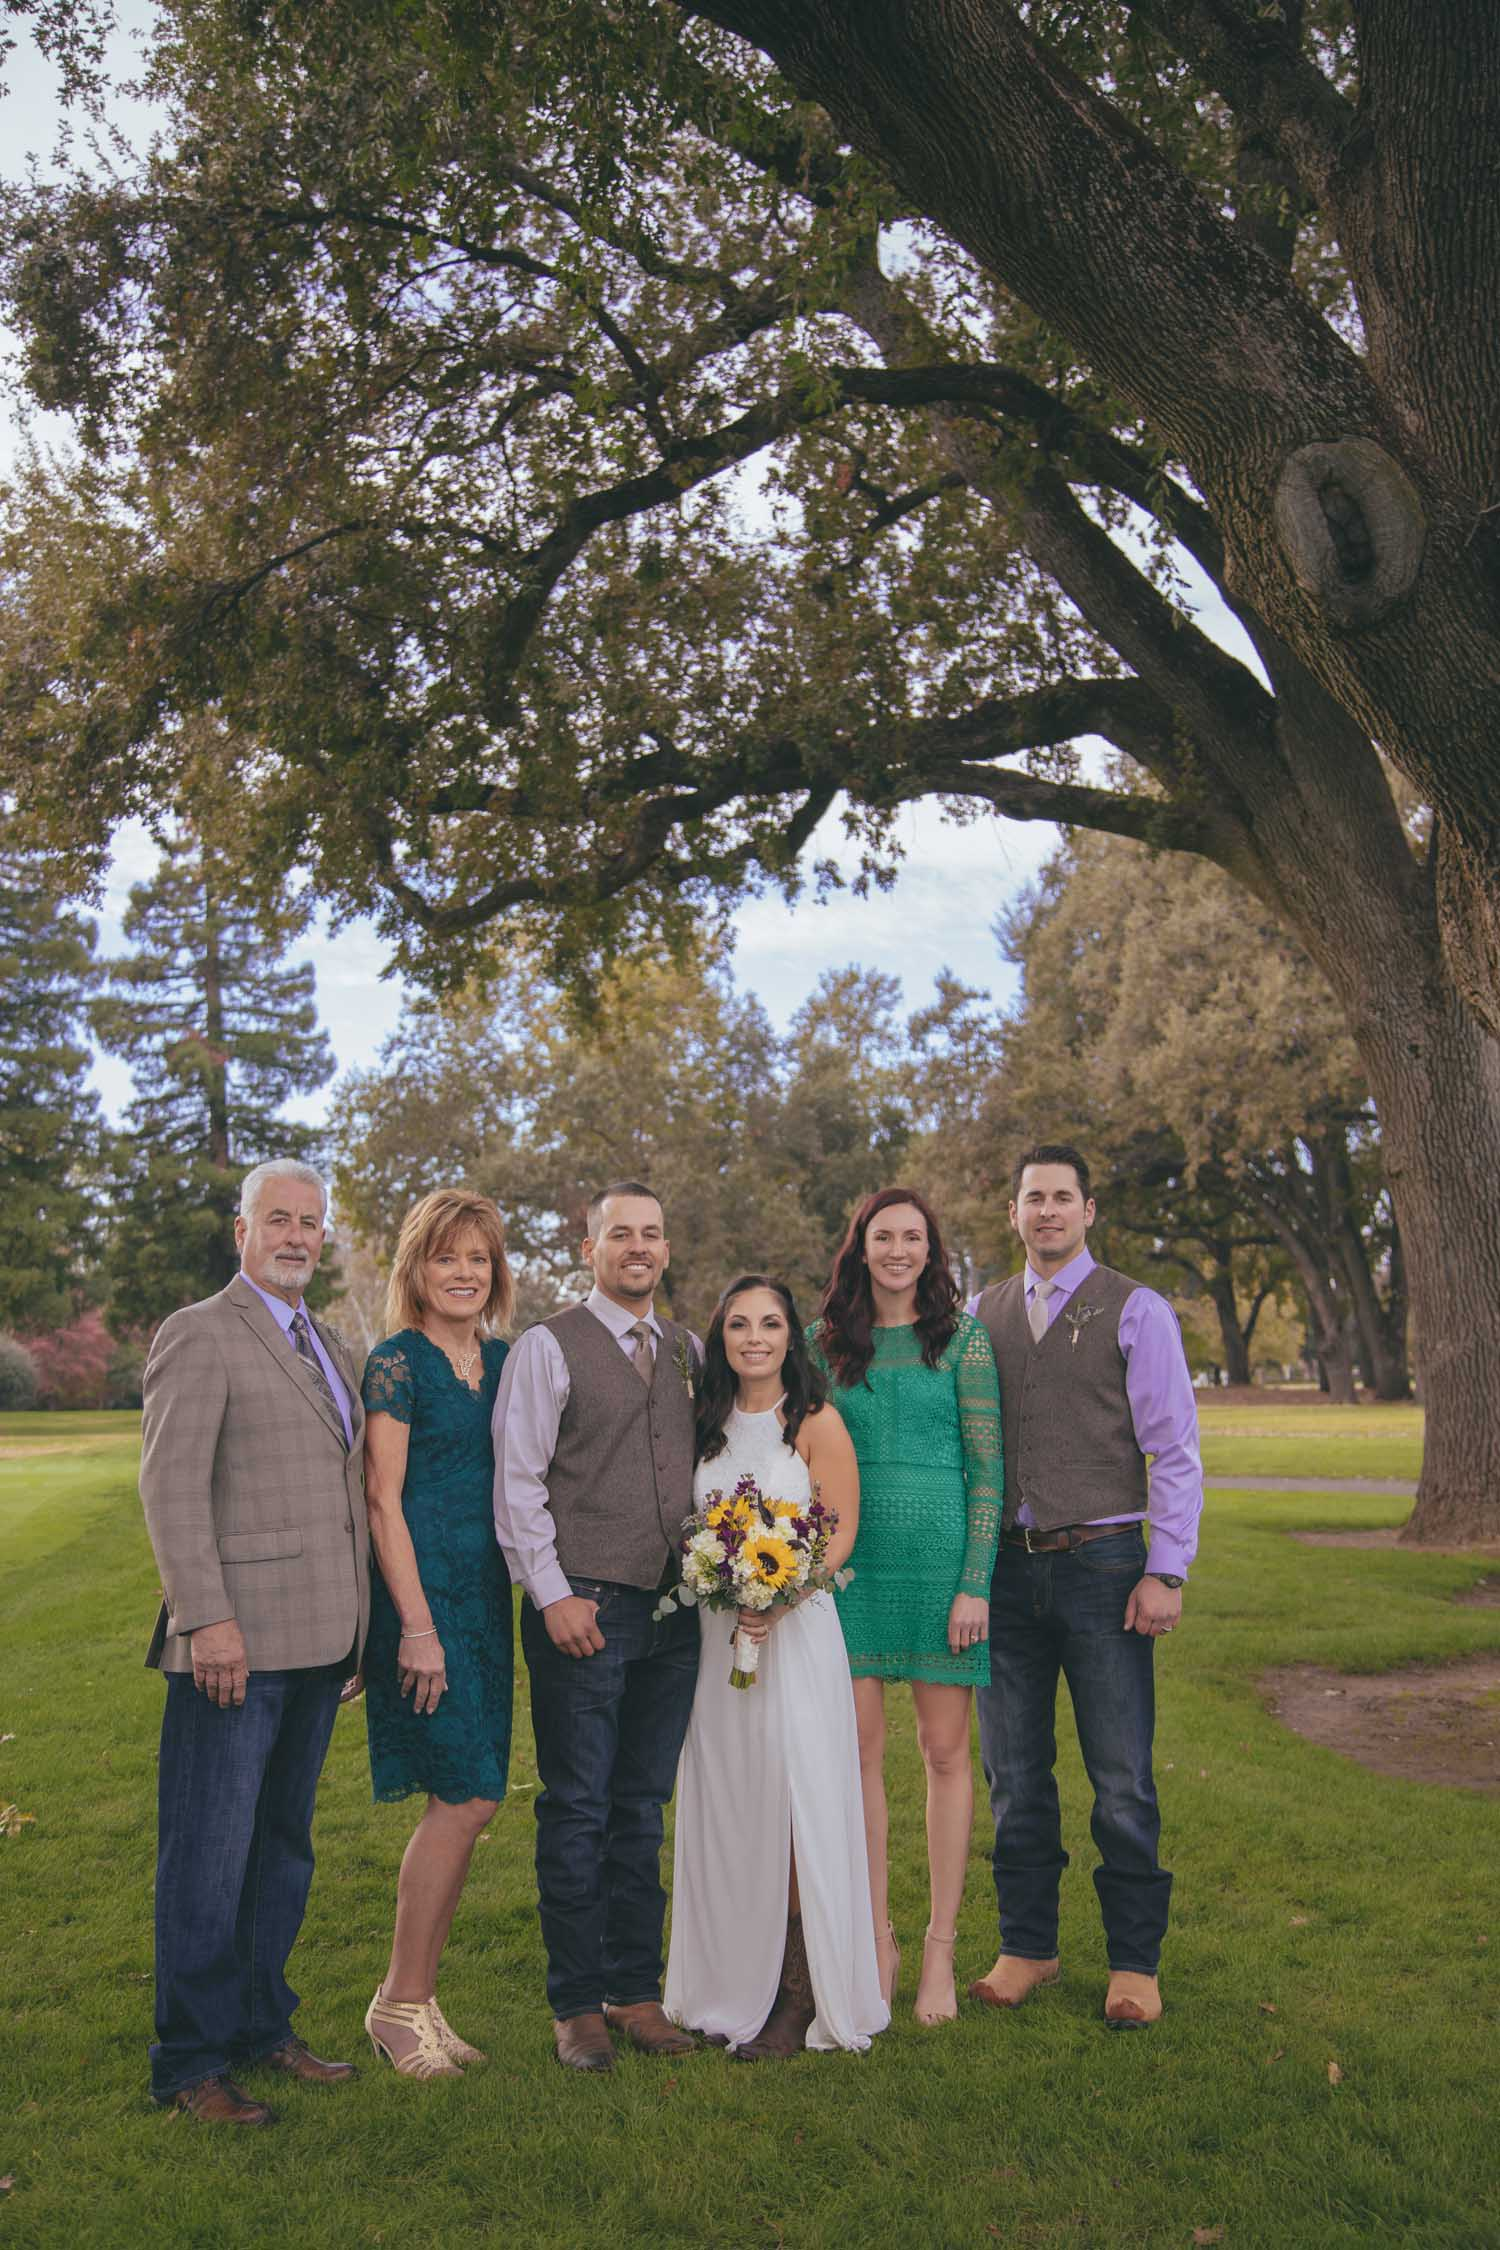 Bonnie-Scott-Rustic-Wedding-Chico-Ca-Butte-Creek-Country-Club138.jpg